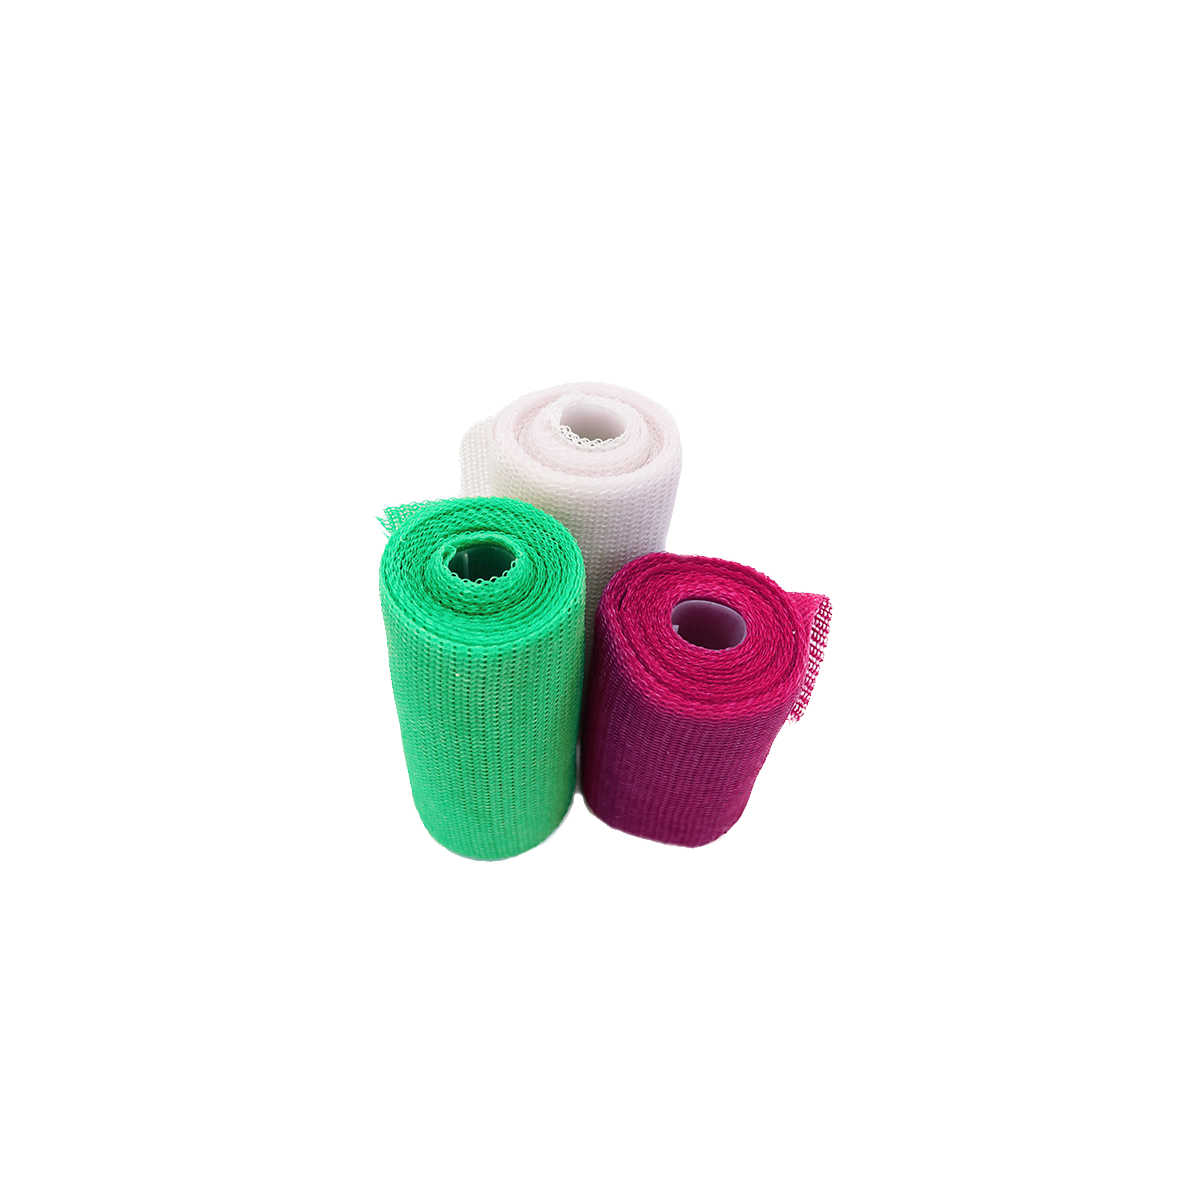 Plaster cast tape